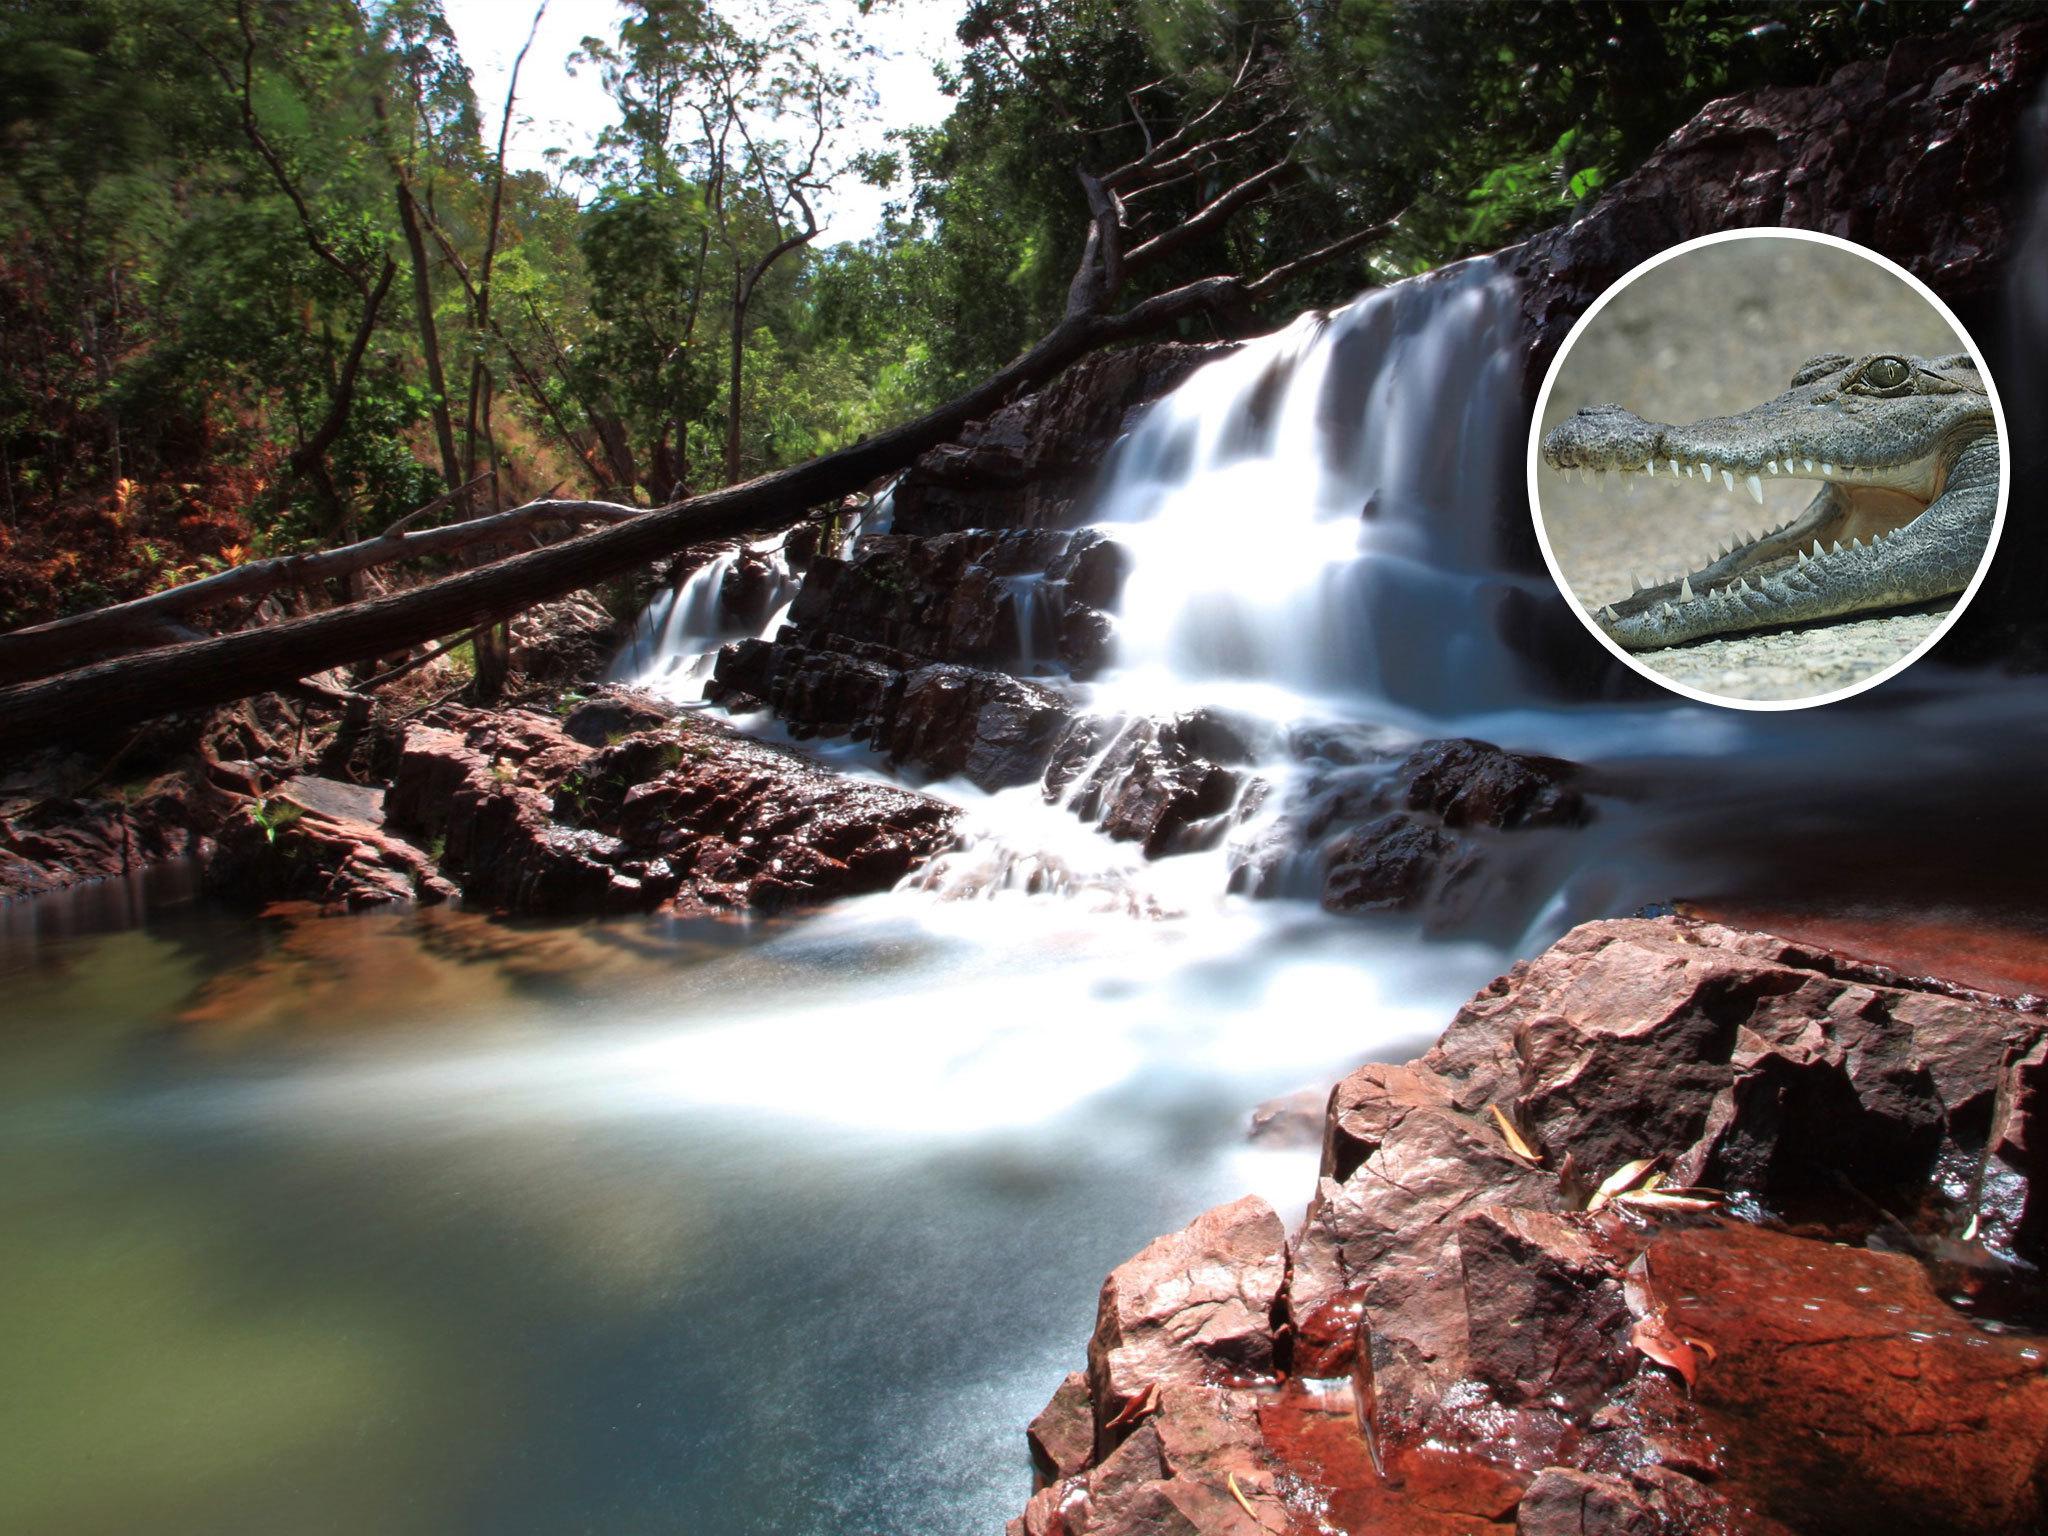 Australia on a plate - Crocodile